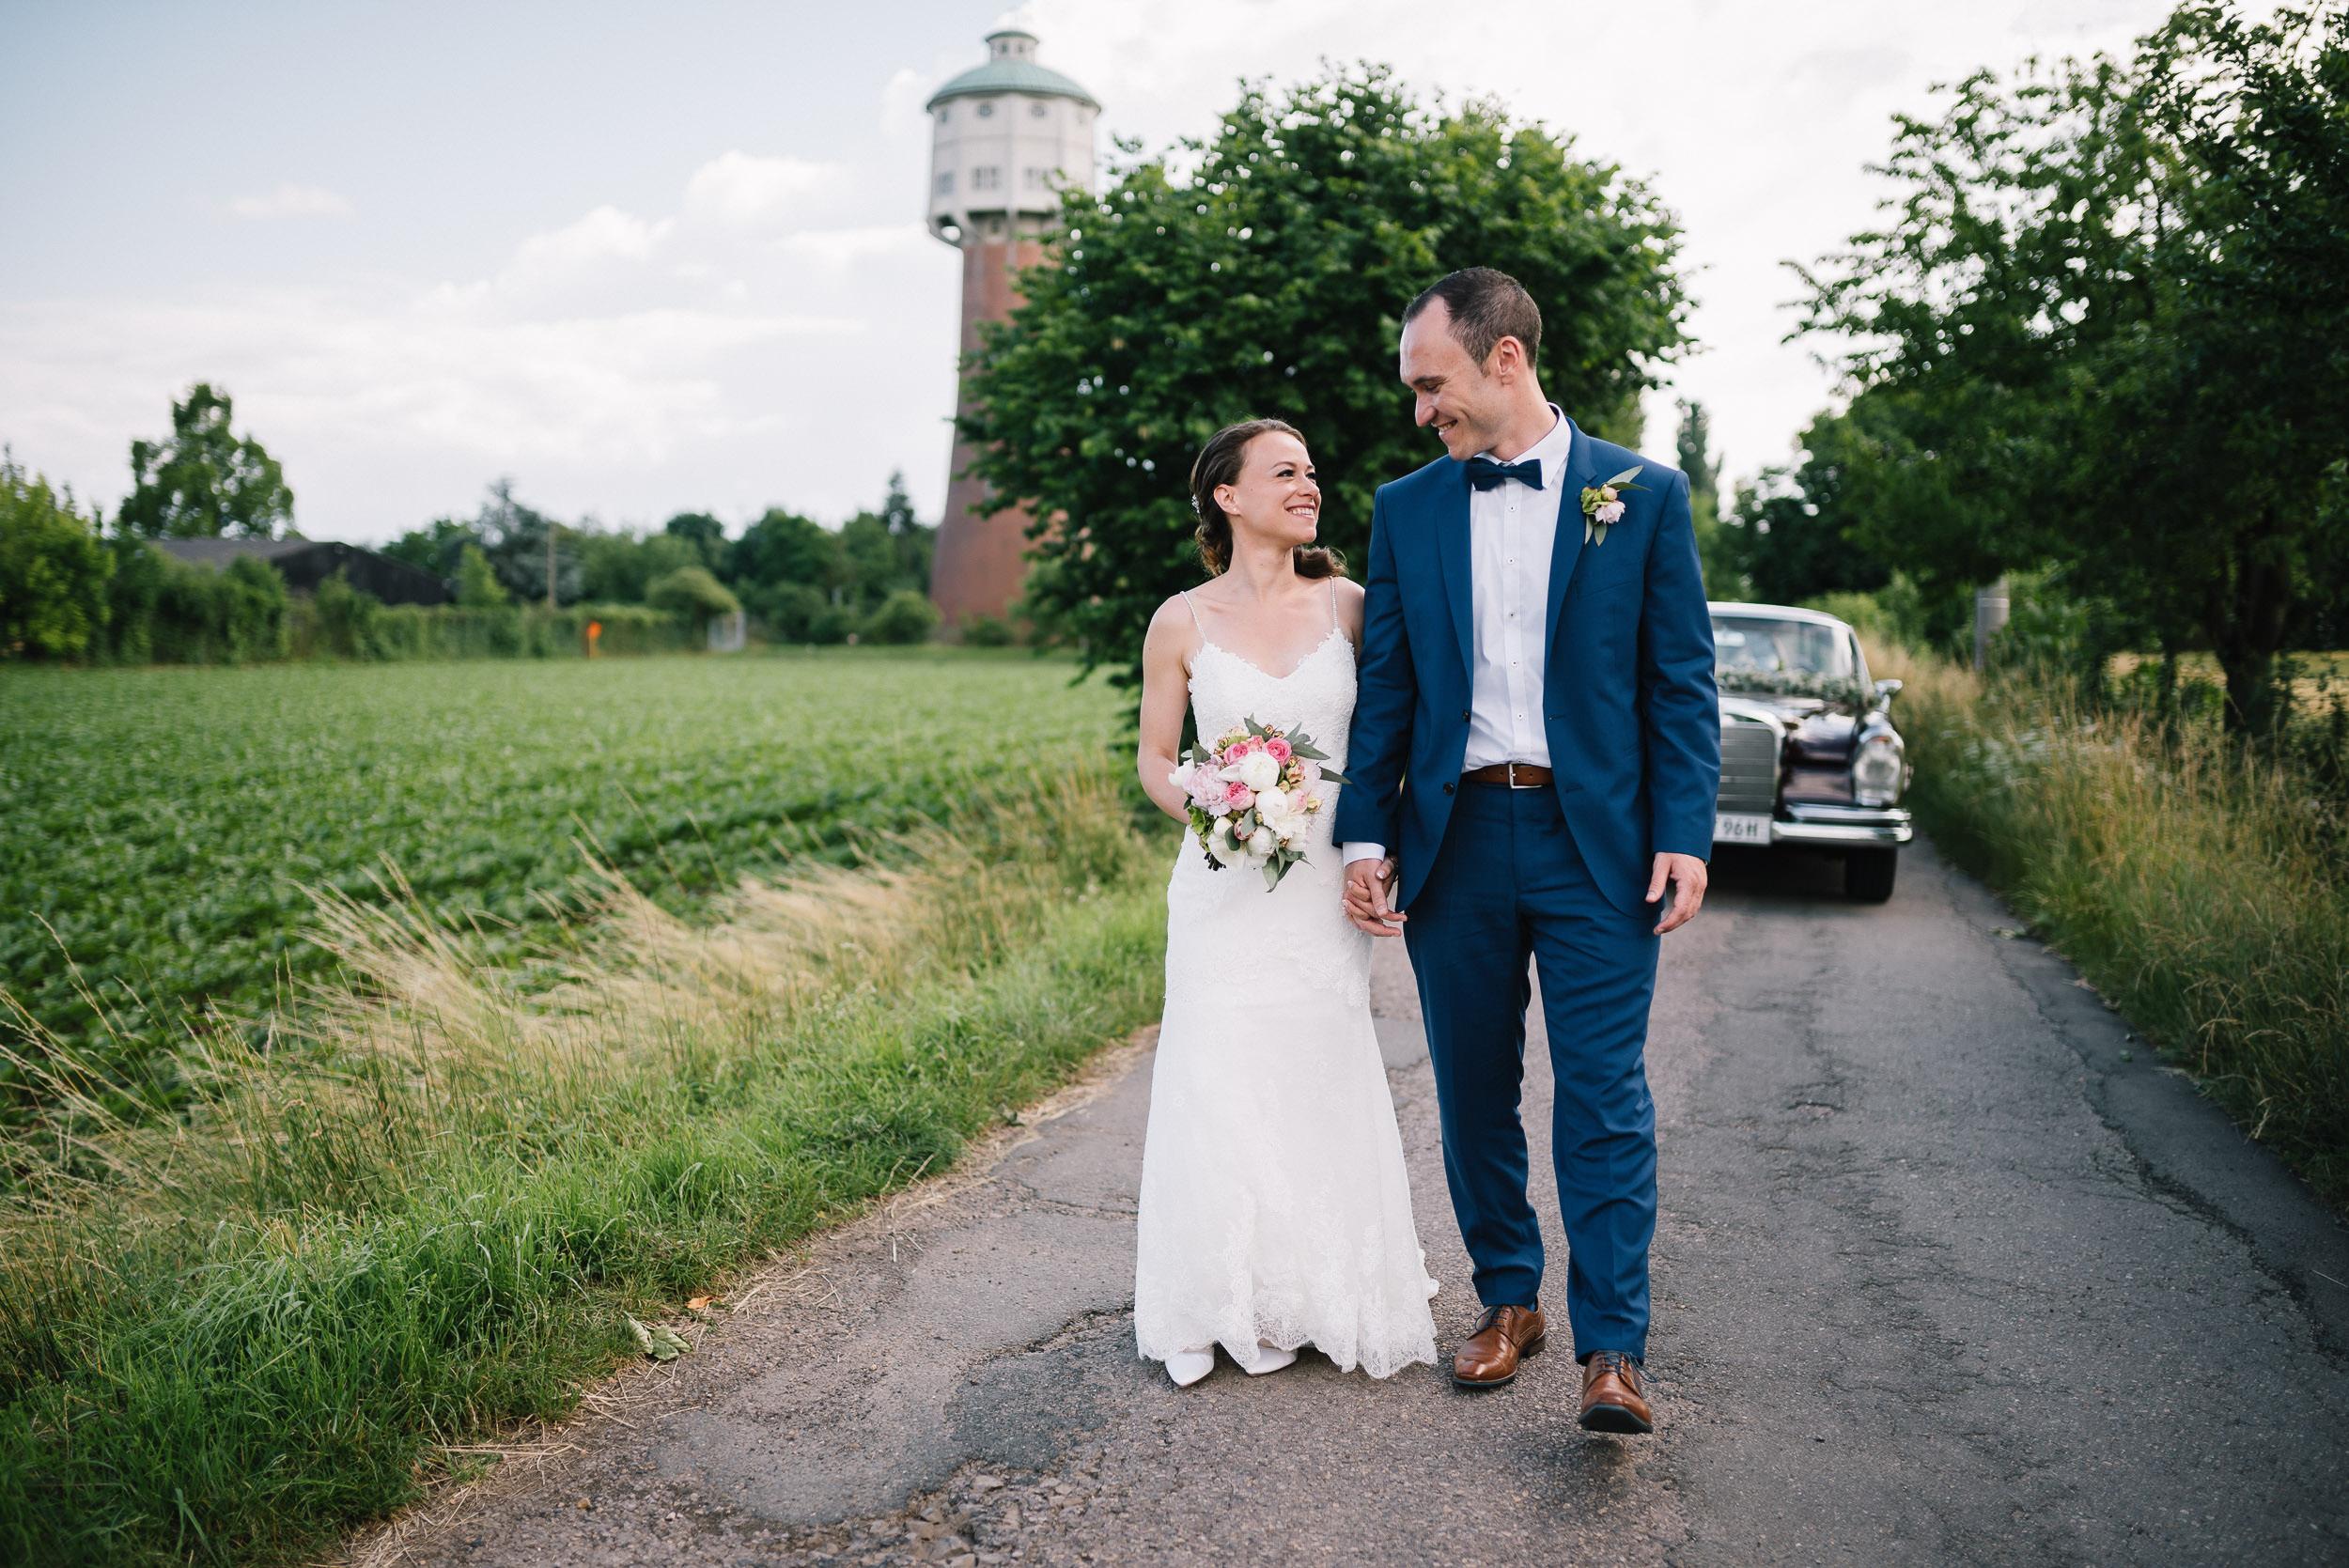 Hochzeit-Julia+Lars-Leimen+Bonsaizentrum-HD-049.jpg